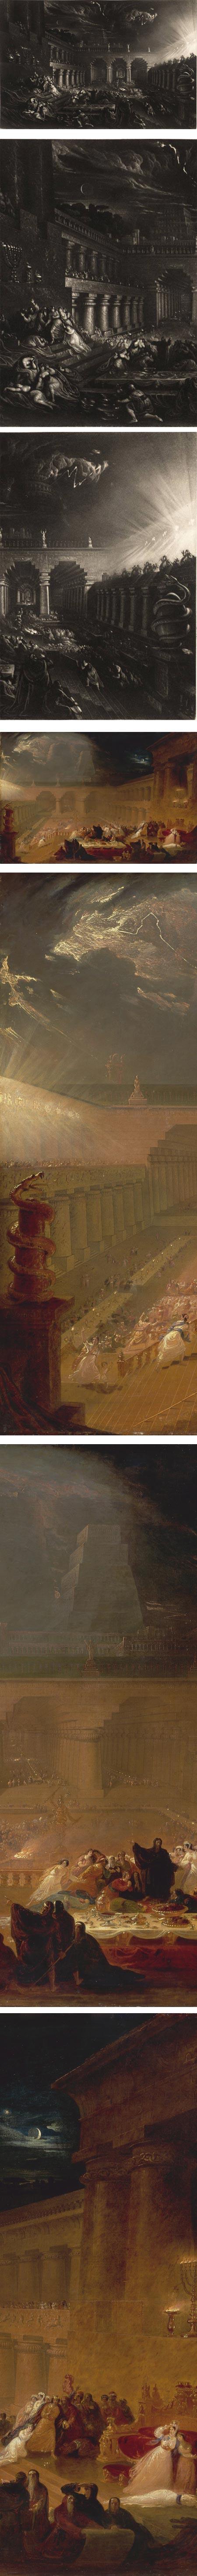 Belshazzar's Feast, mezzotint and painting; John Martin